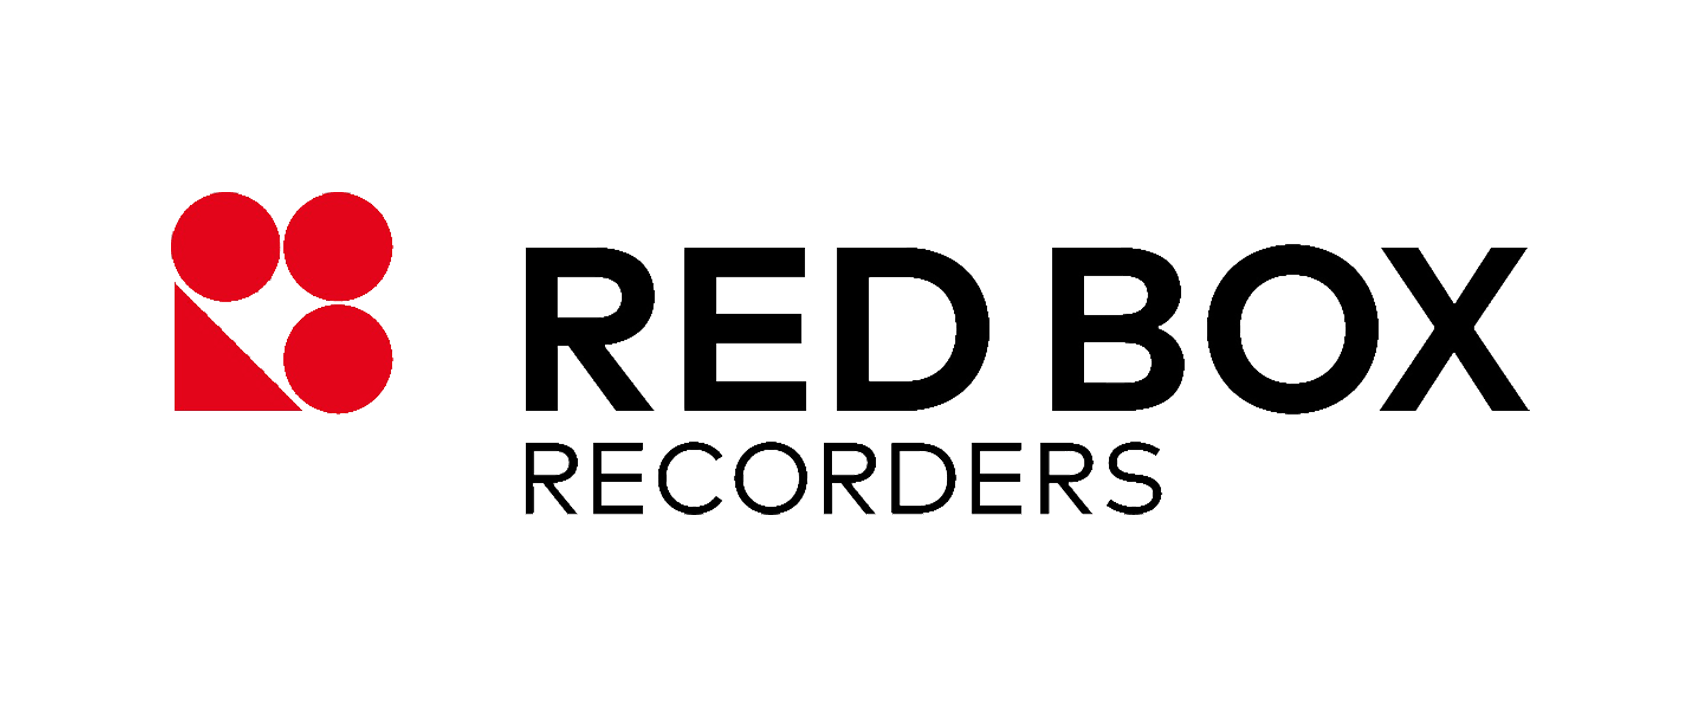 hight resolution of redbox post new 2x red box